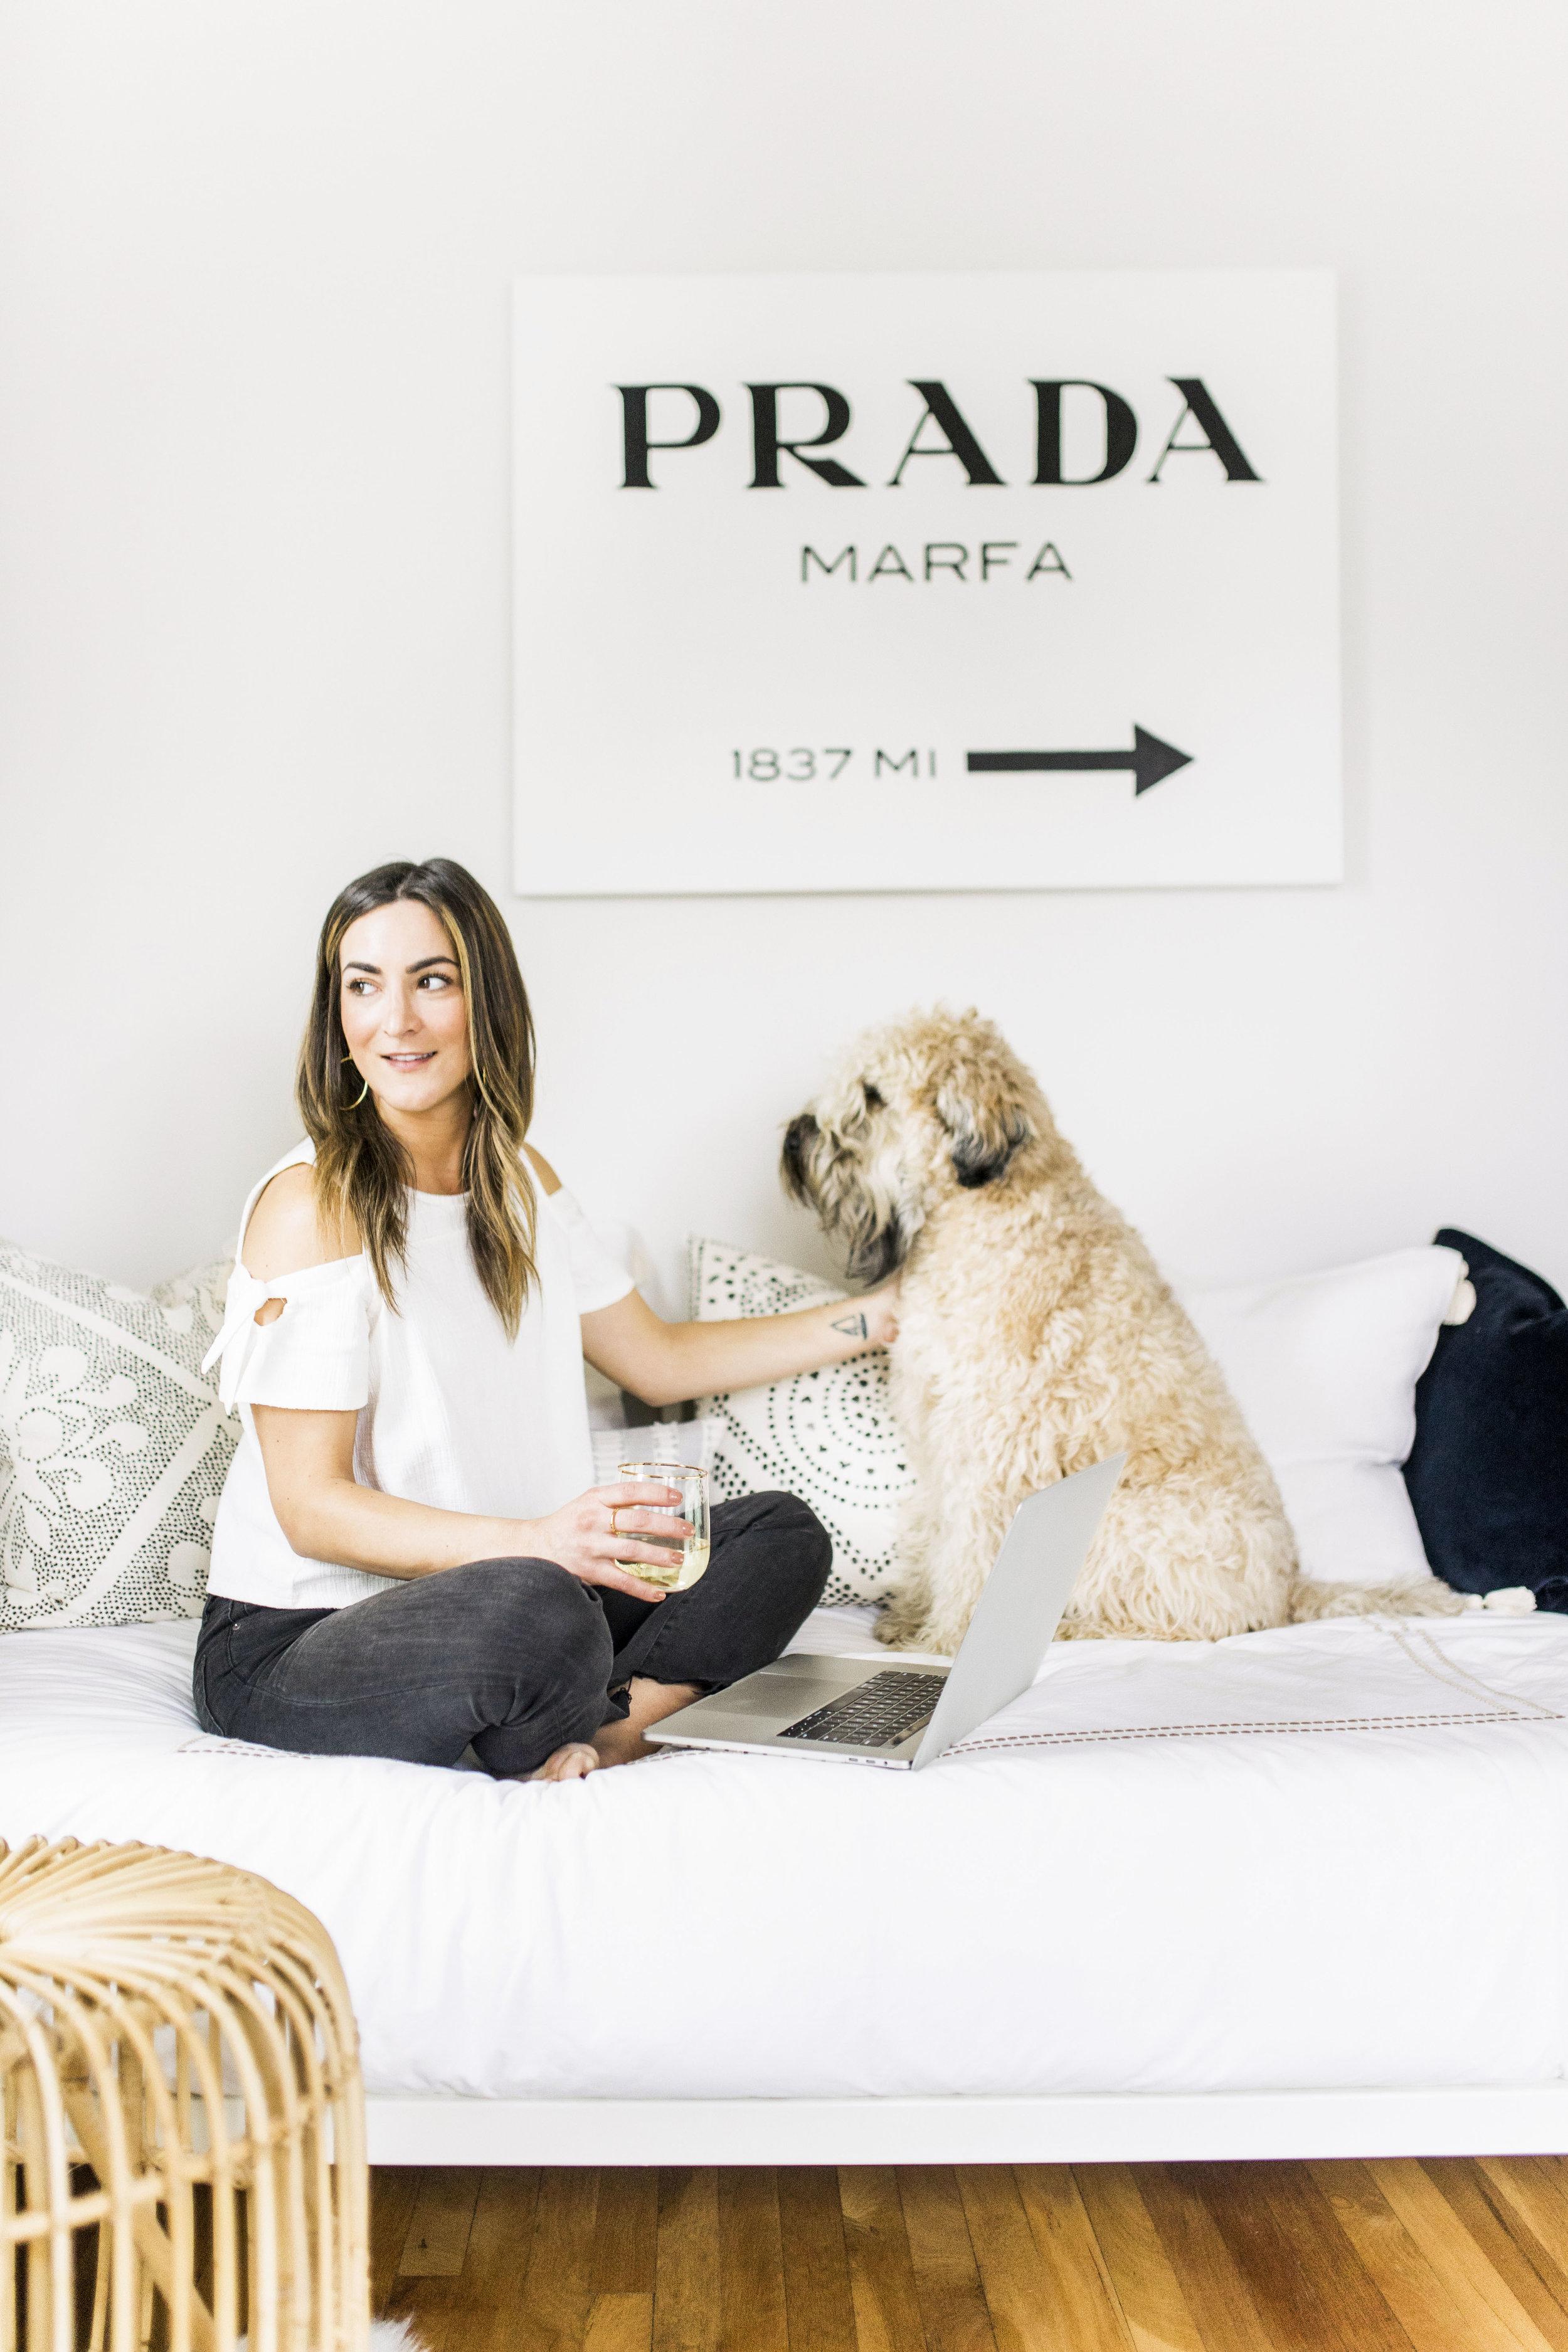 prada-marfa-guest-room.jpg